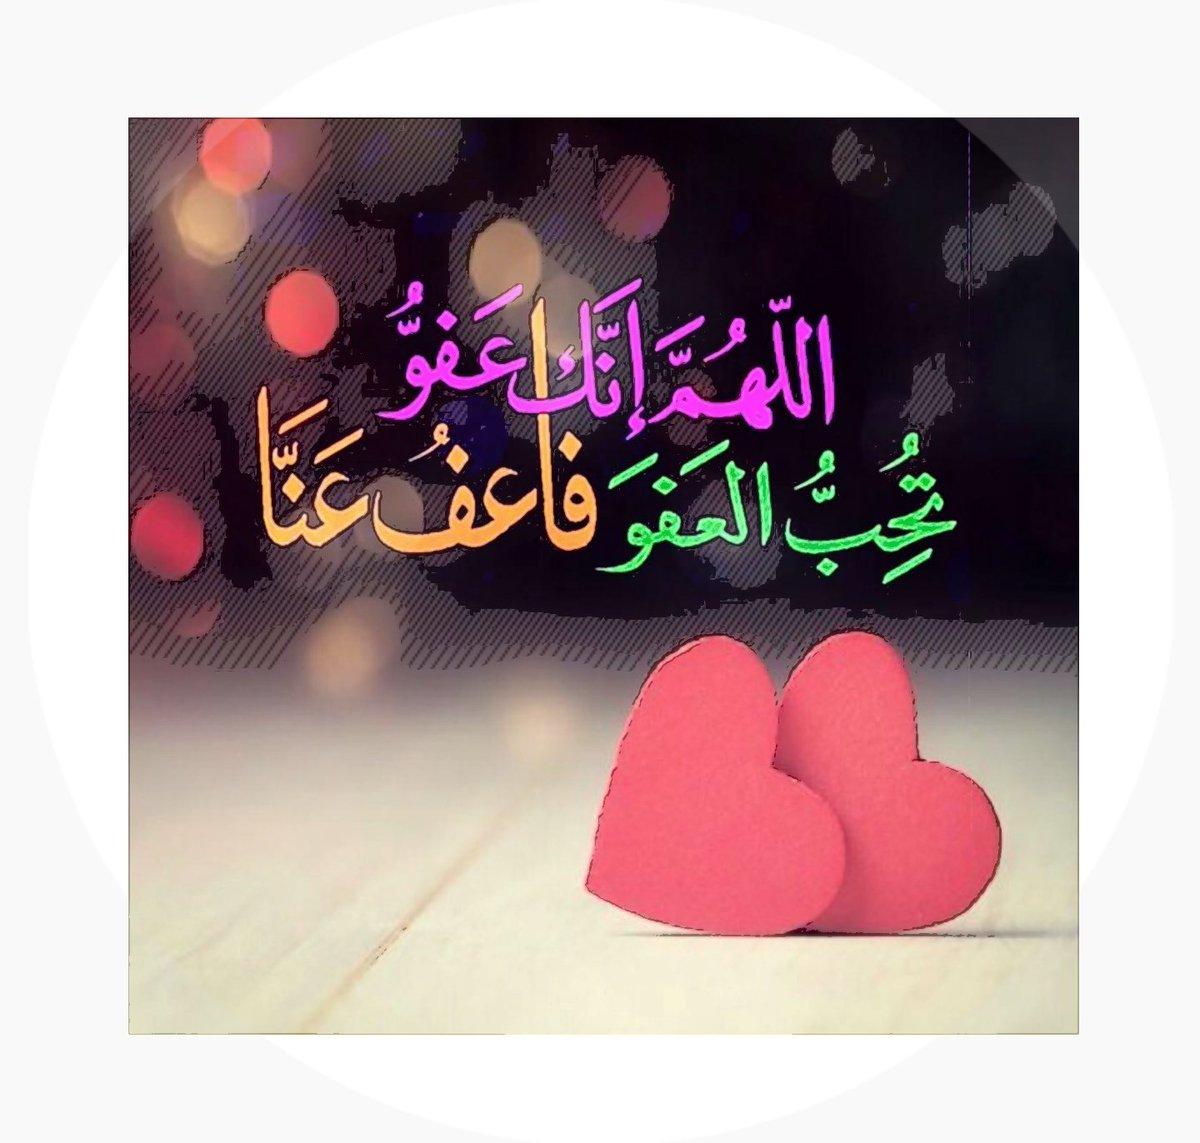 "❤ latifa Al kandari ❤ on Twitter: ""#ساعة_استجابة اللهم انك عفو كريم تحب  العفو فاعف عنا… """